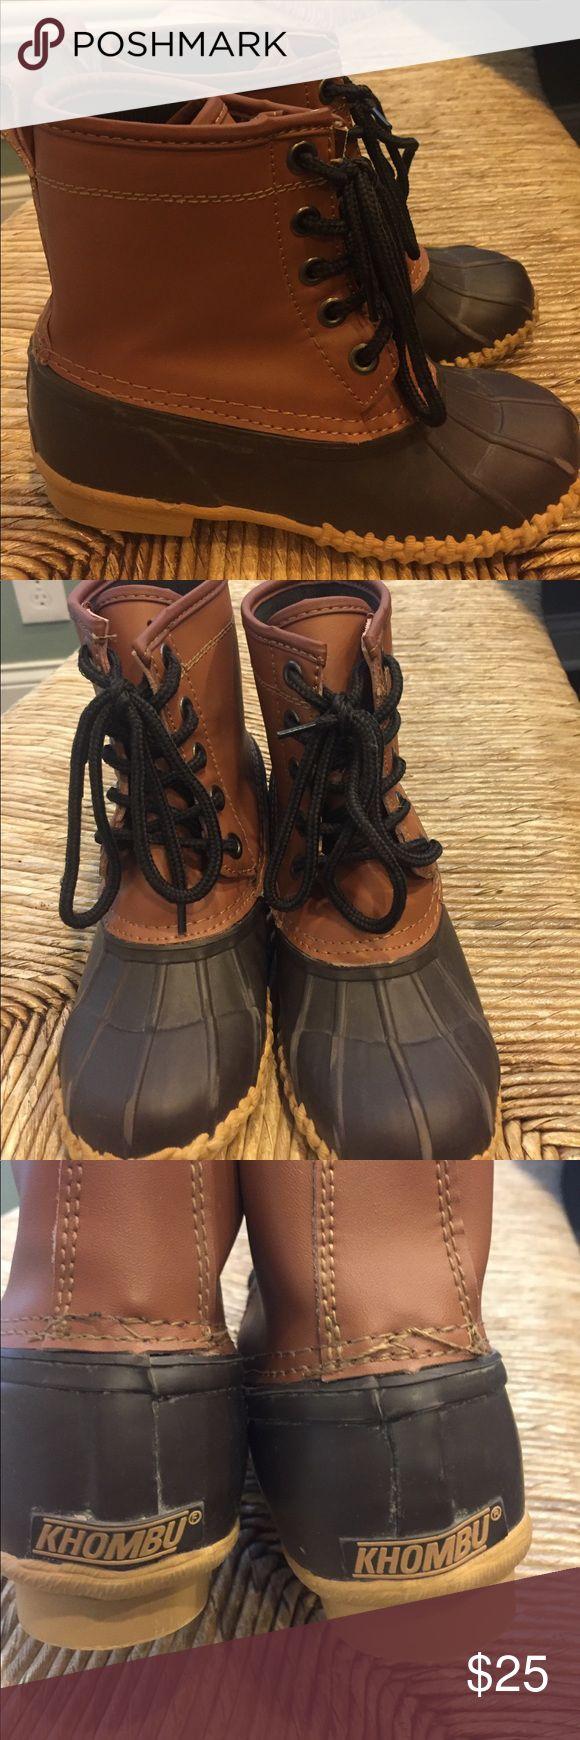 Khombu kids duck boots Khombu kids duck boots, worn 2-3x Khombu Shoes Rain & Snow Boots